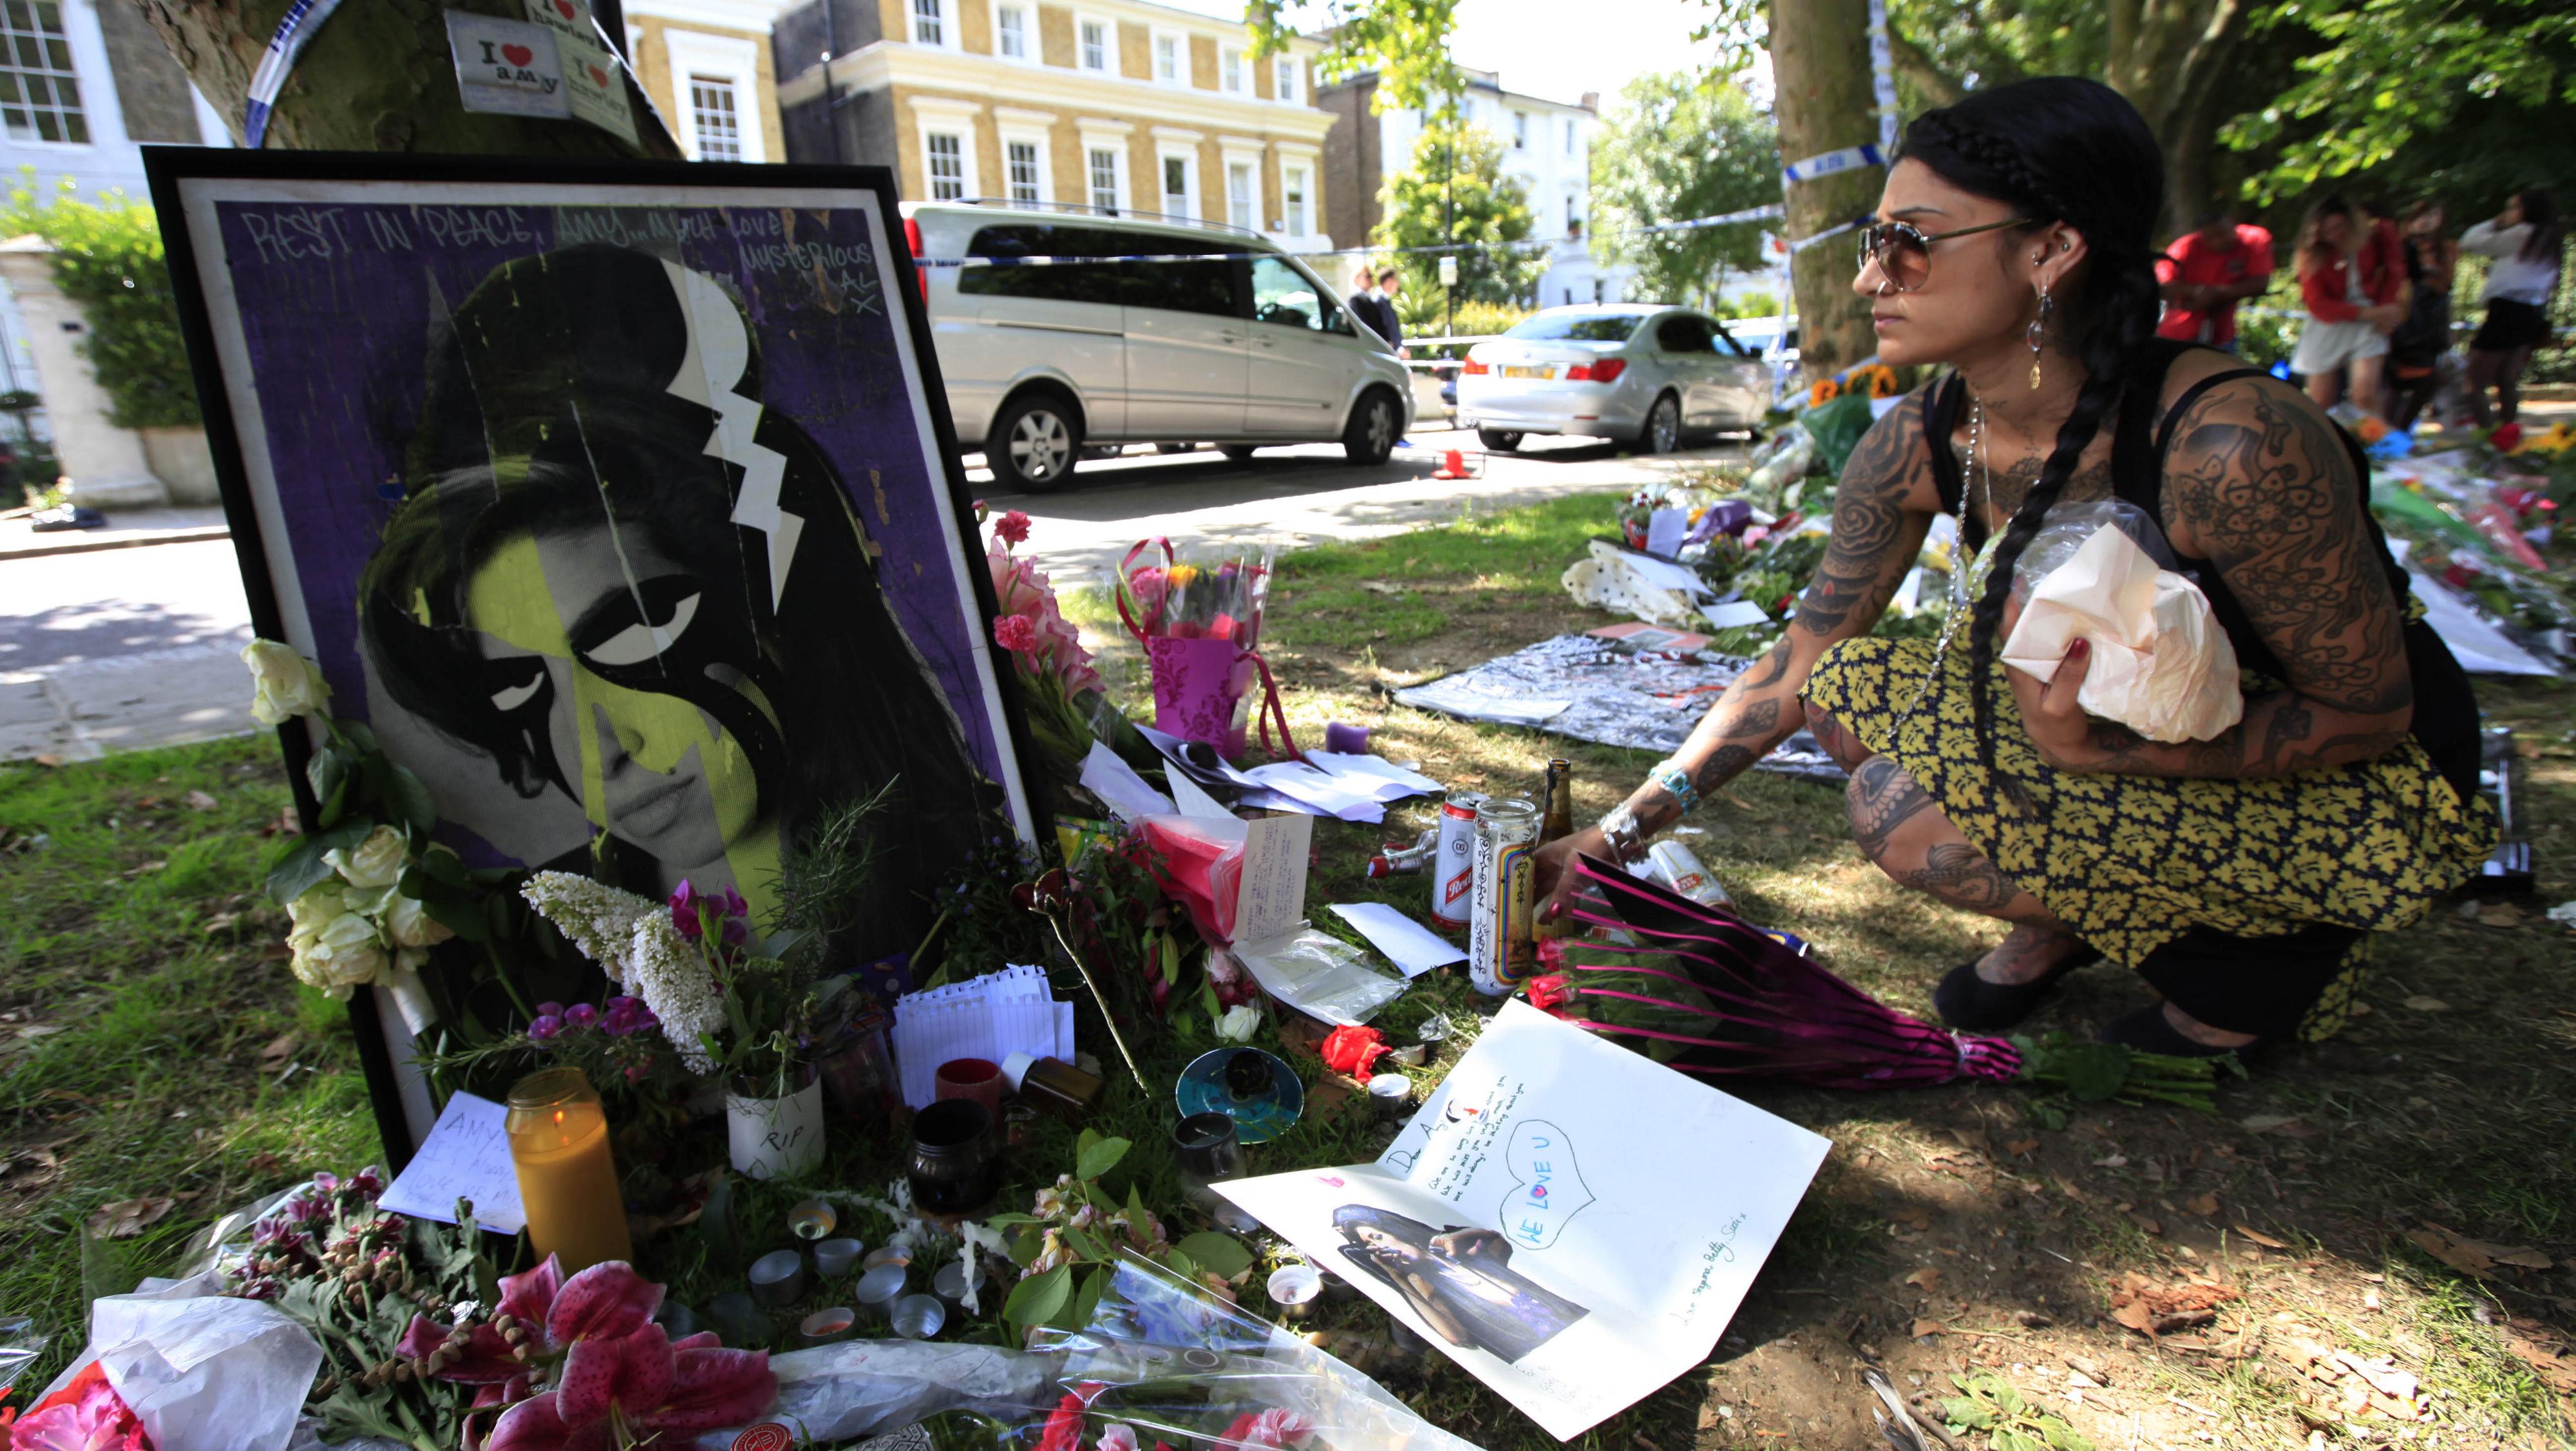 Amy Winehouse memorial